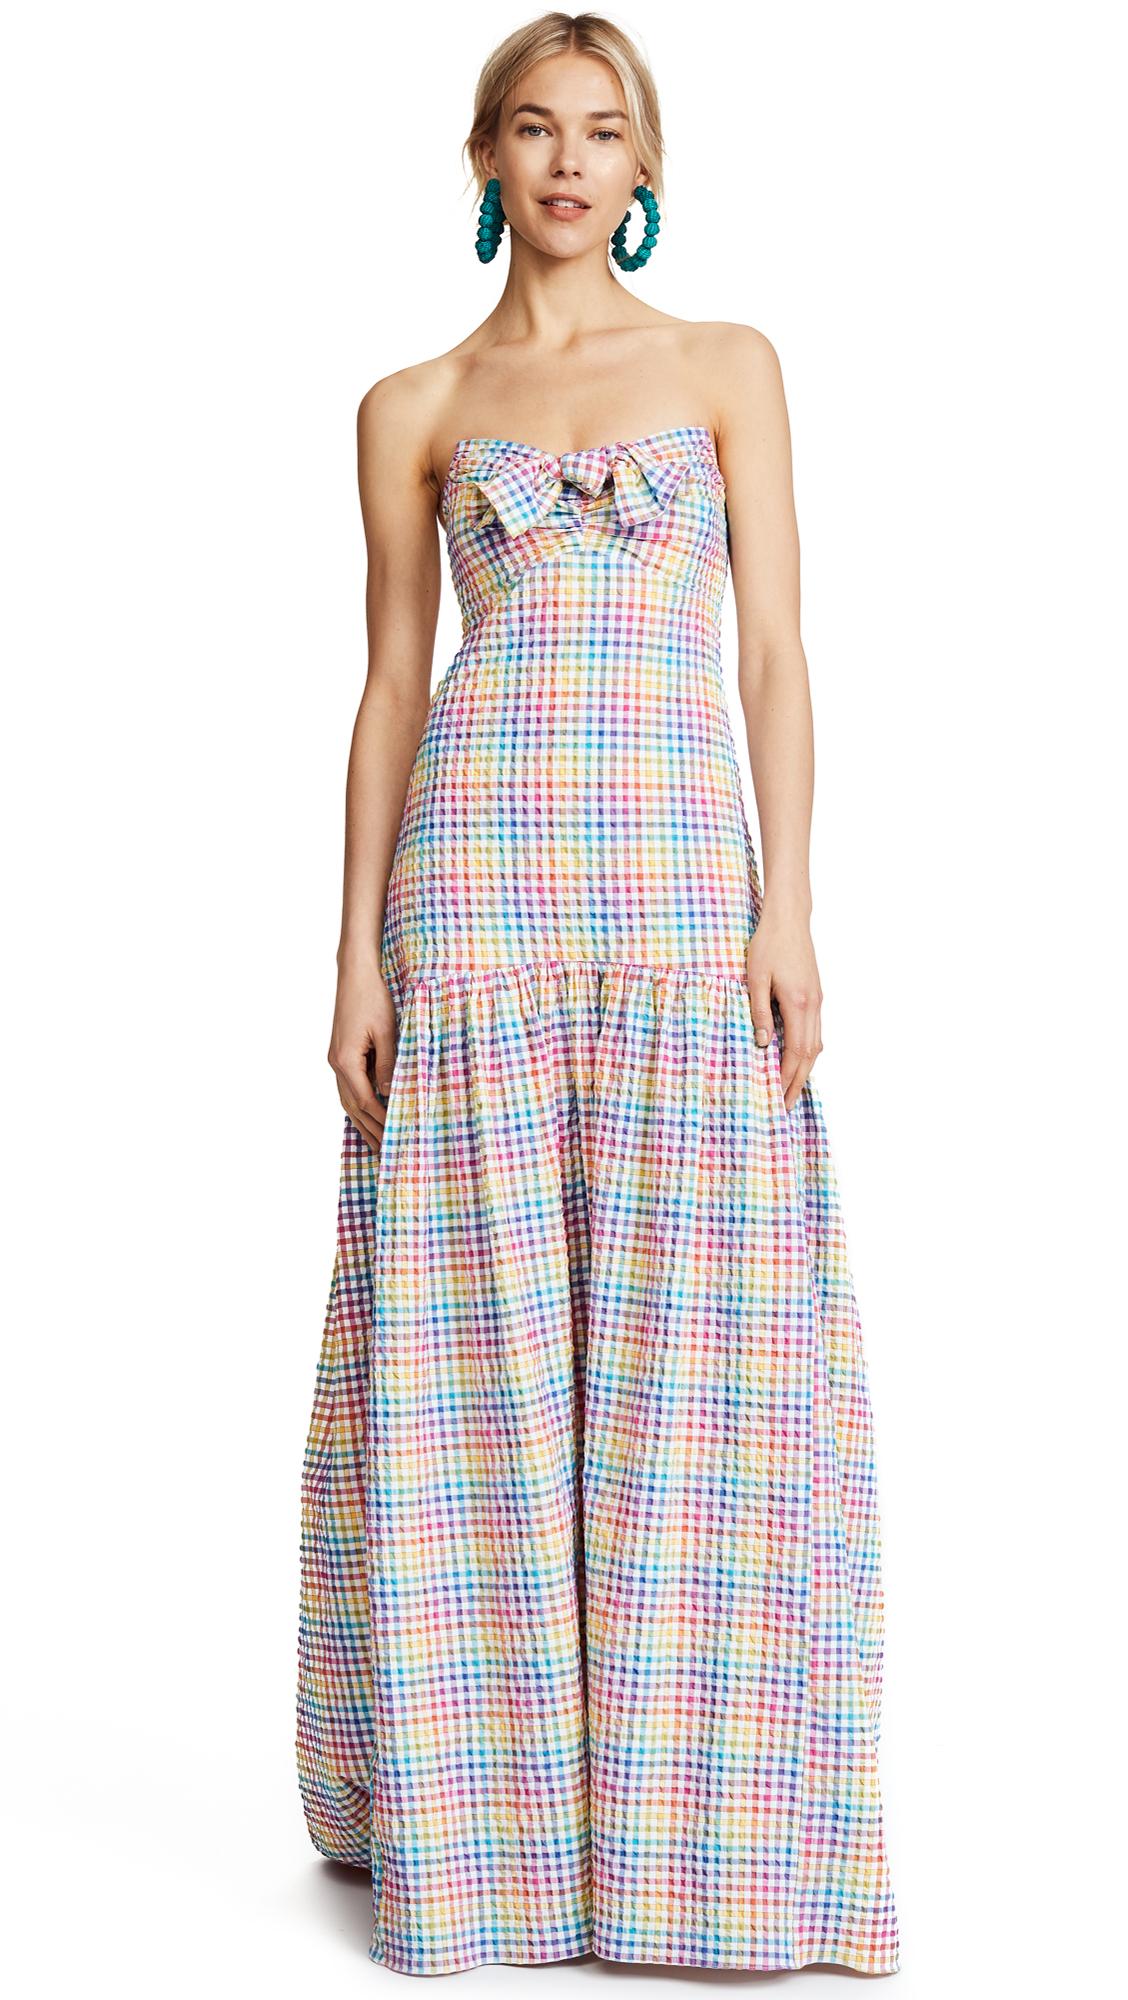 Caroline Constas Strapless Bustier Dress